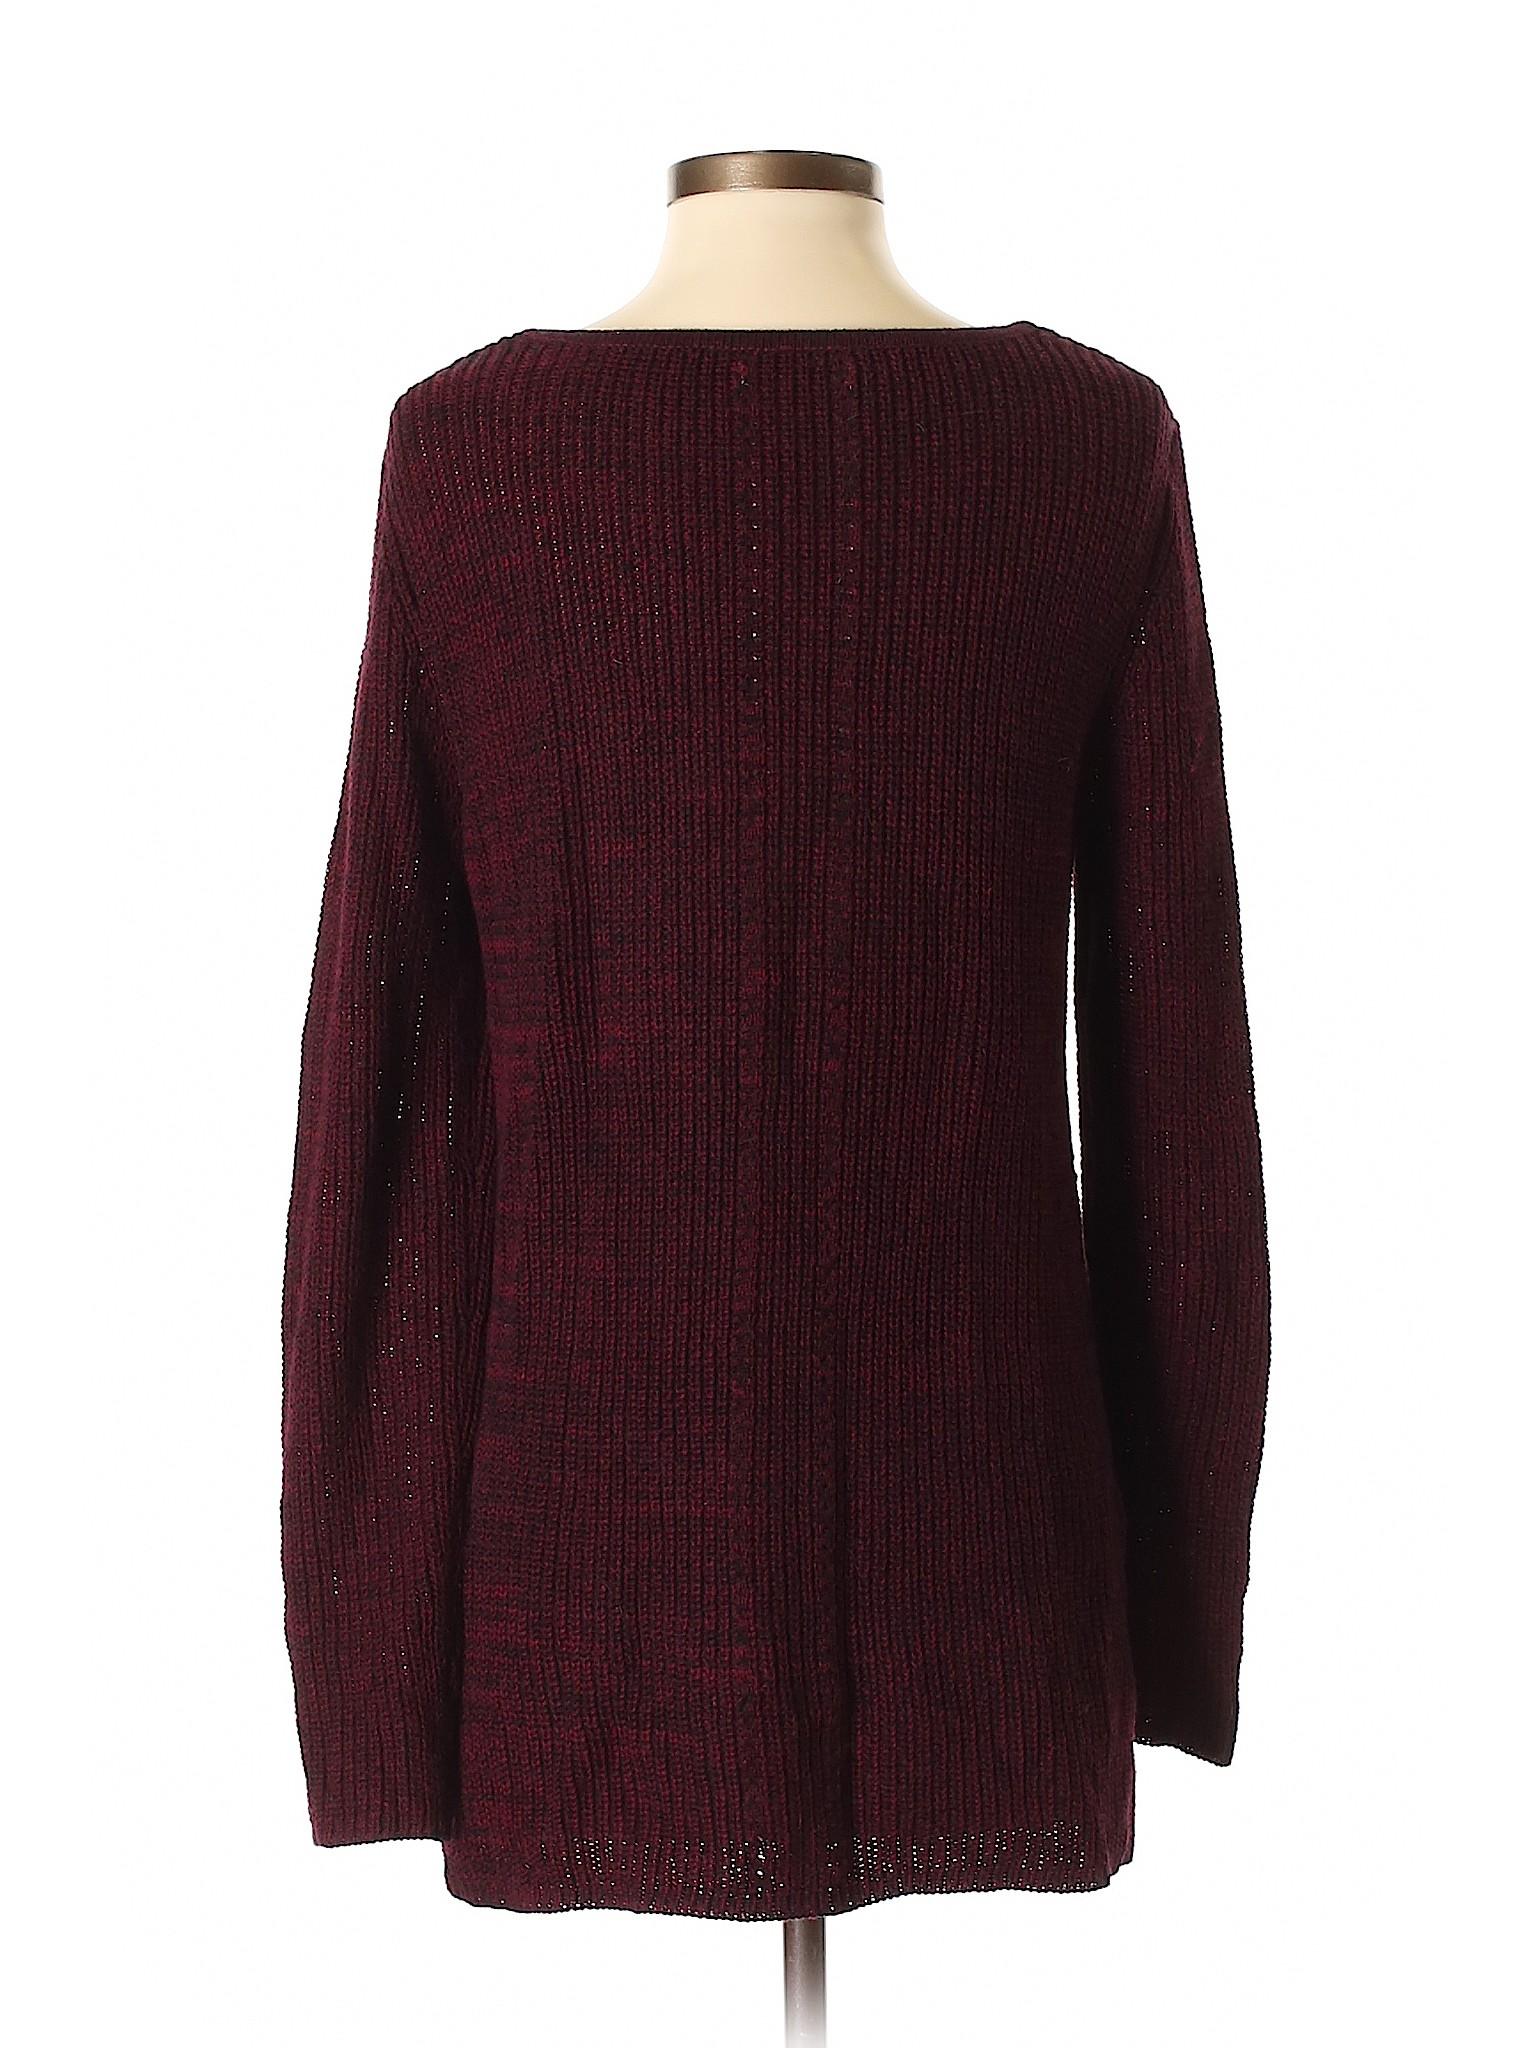 Pullover Boutique Pullover Sweater Buchman Pullover Buchman Buchman Boutique Boutique Dana Dana Sweater Dana H0dtwqH